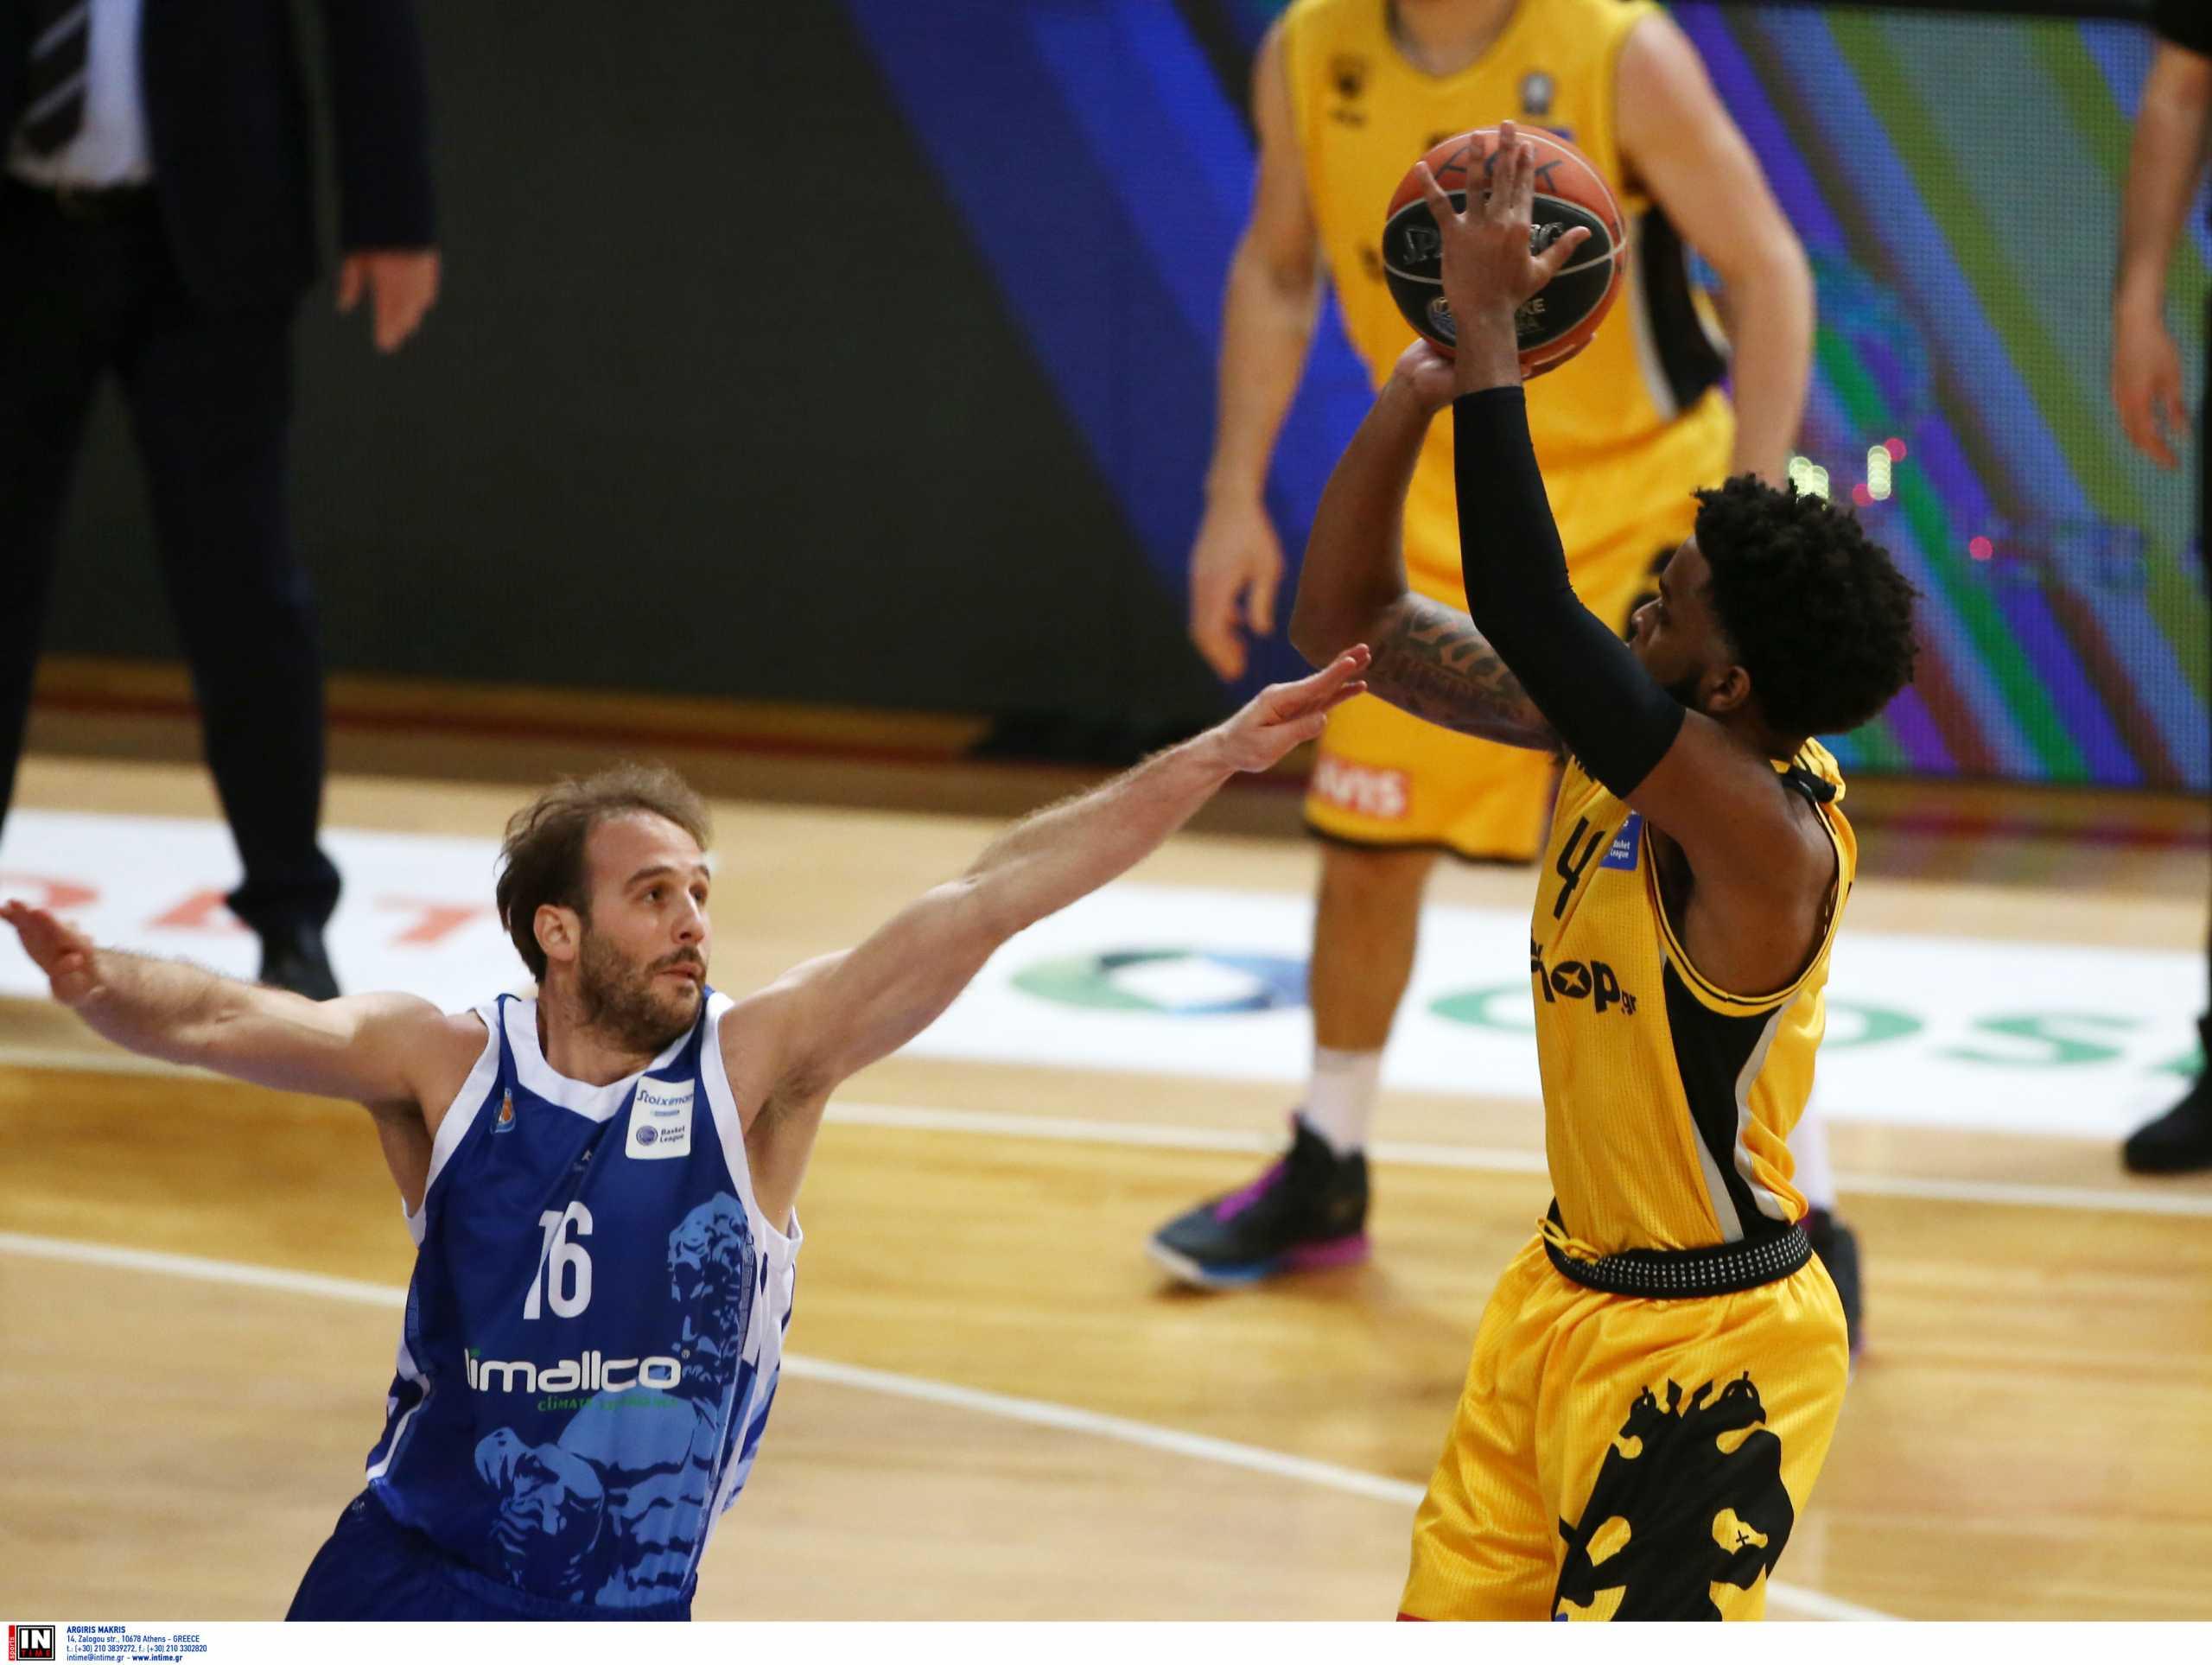 Basket League: Η ΑΕΚ «λύγισε» τον Ηρακλή με buzzer beater του Μέικον στην παράταση (video)